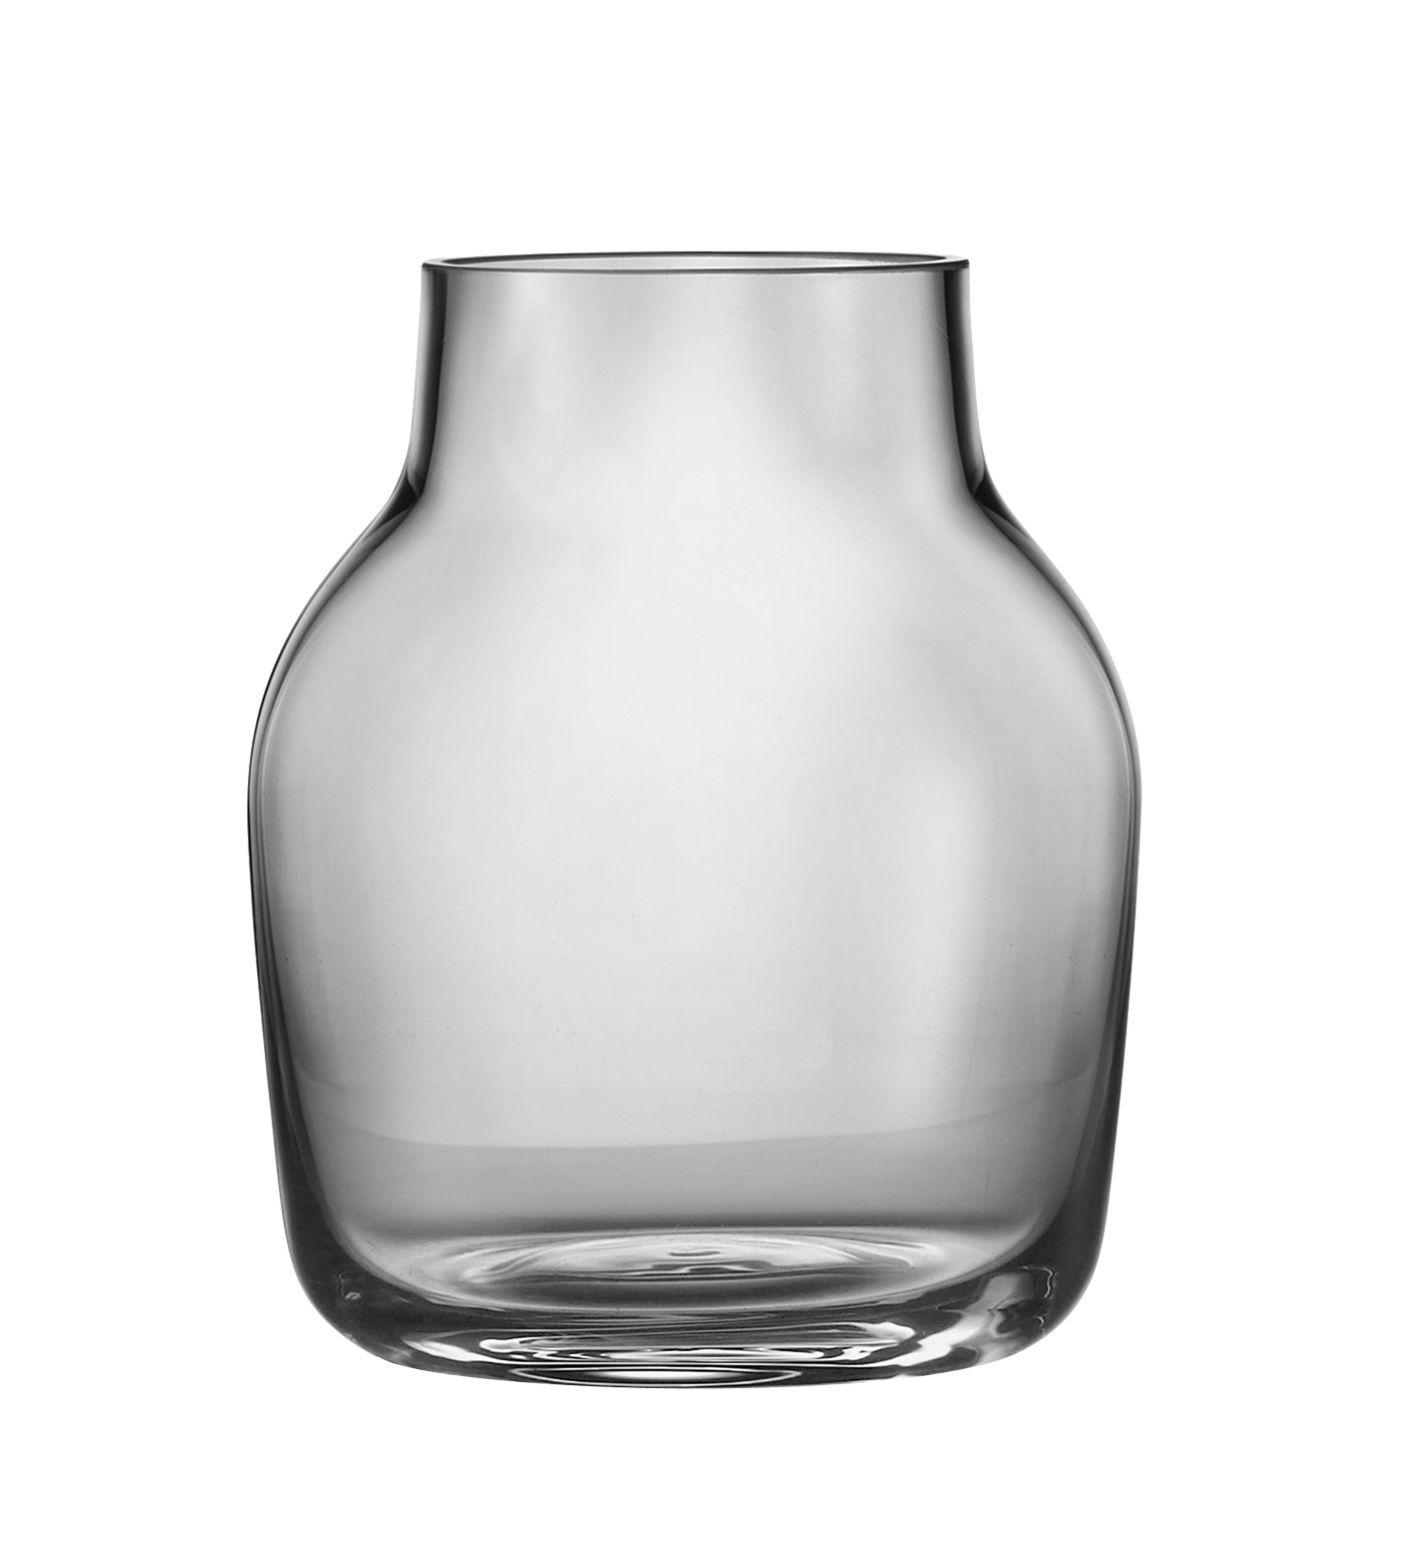 Decoration - Vases - Silent Vase - Ø 11 cm by Muuto - Transparent grey - Blown glass